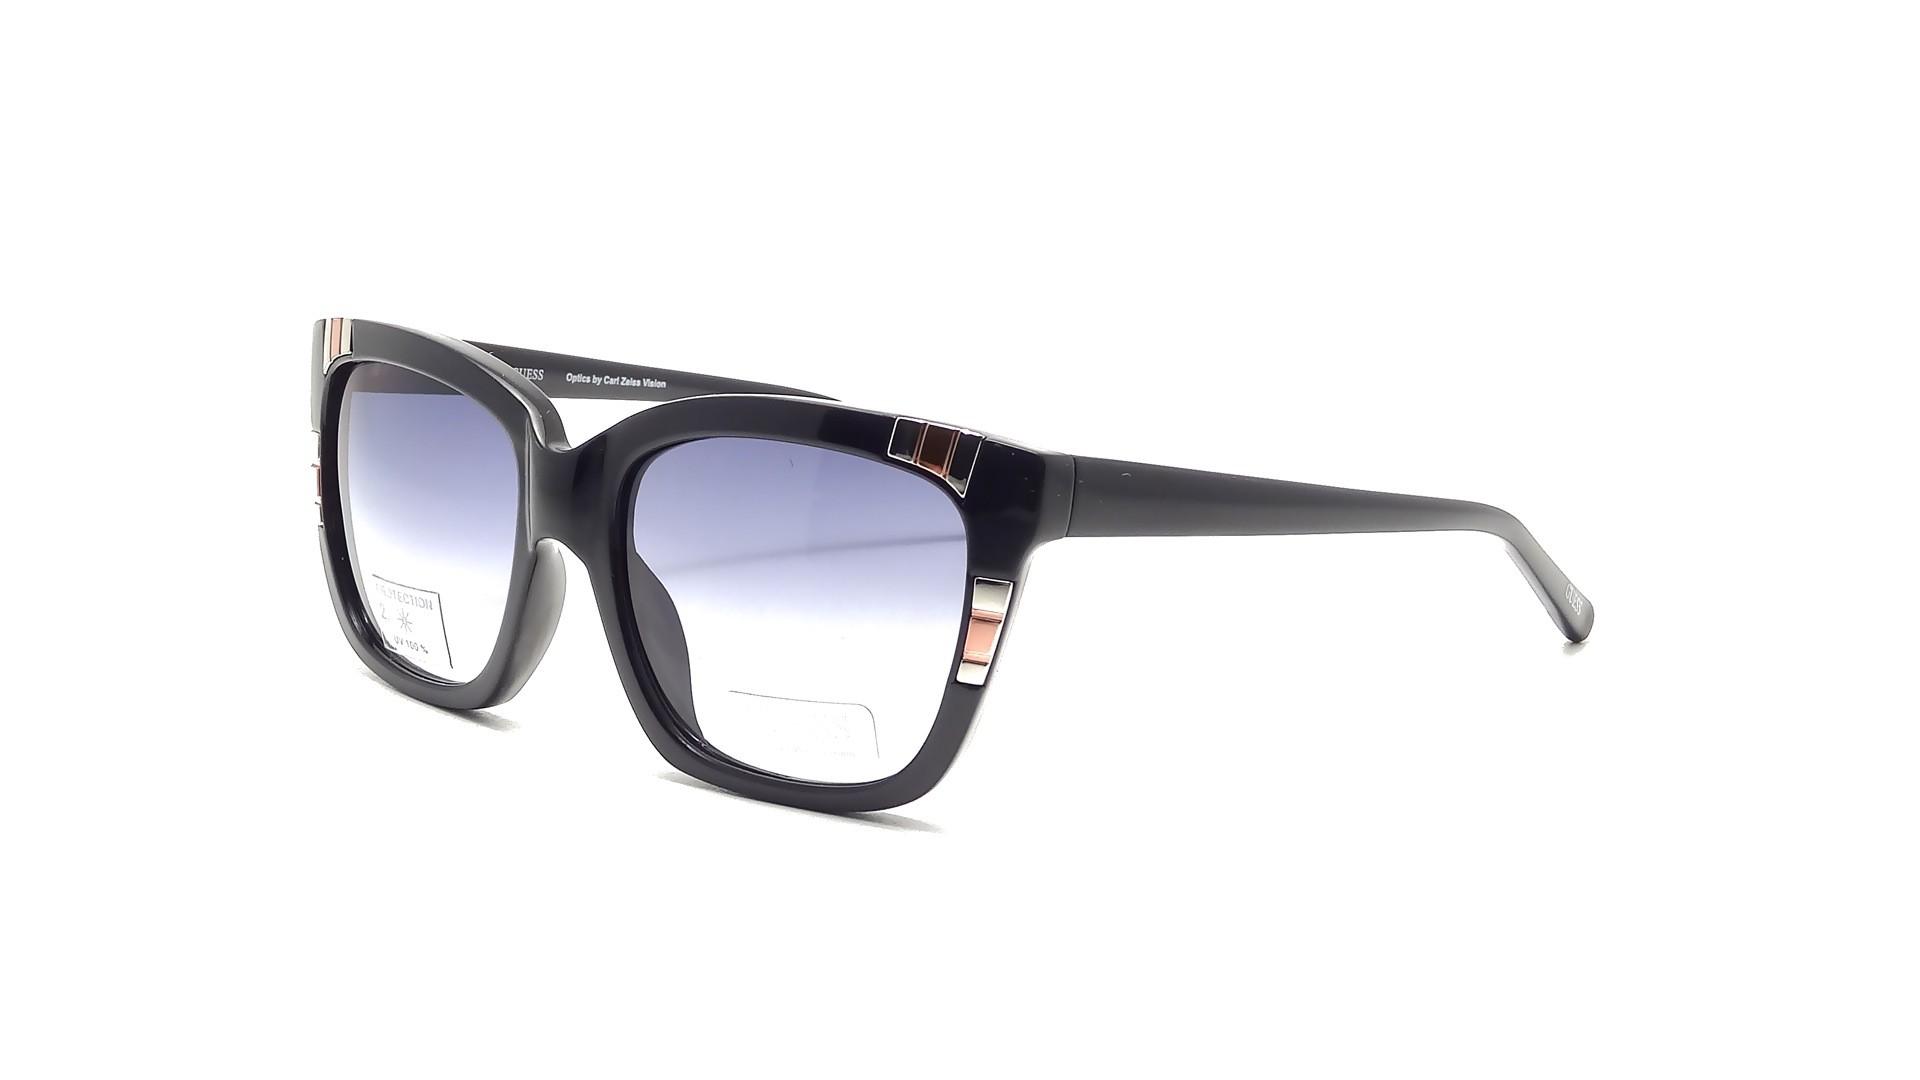 Glasses Frames Recto Or Quiapo : Sun glasses Guess GU 7270 BLK 35 Black Shading Lenses Medium